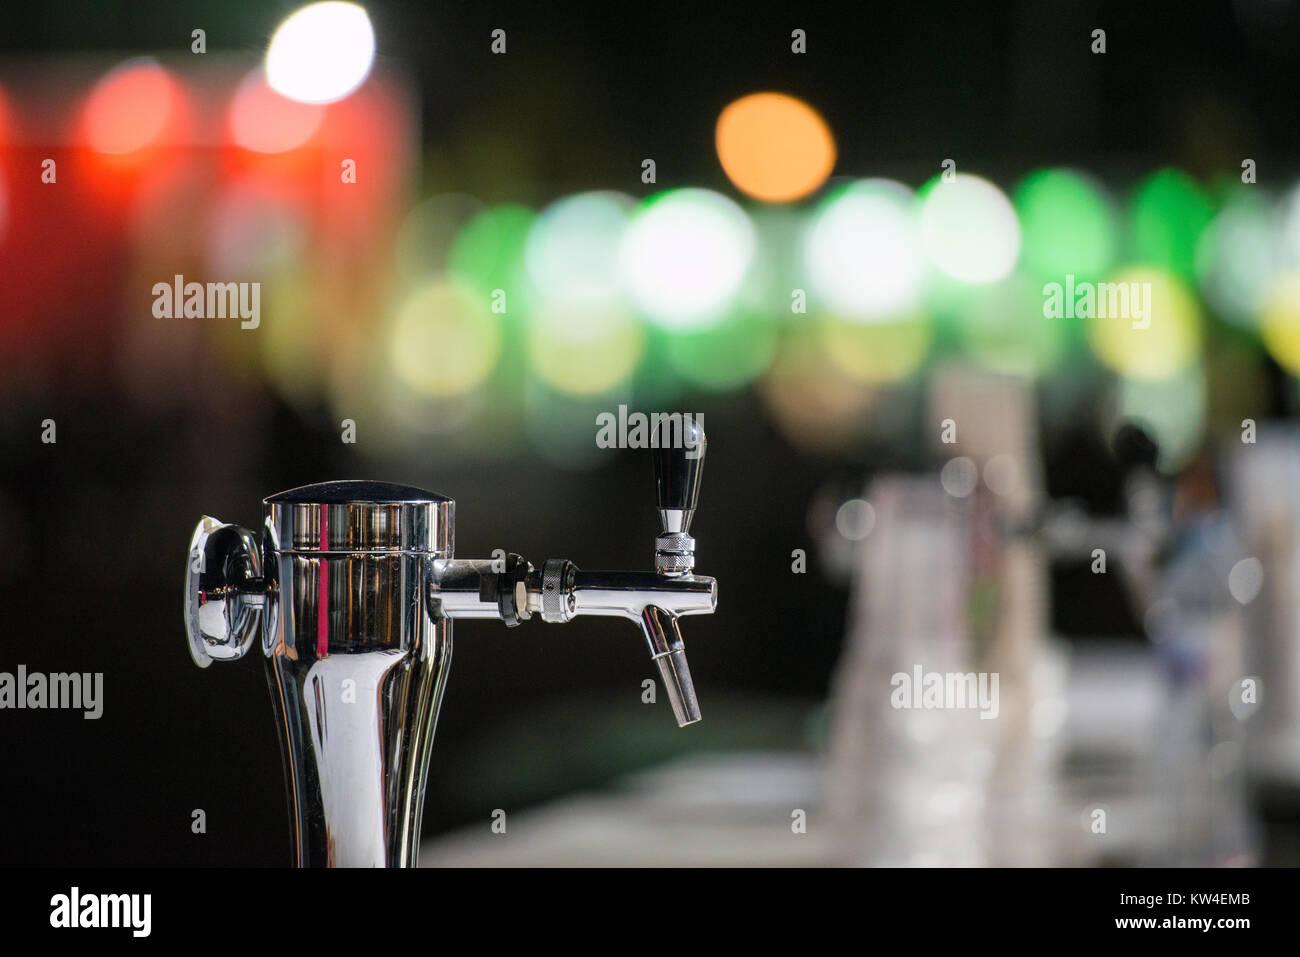 Dispenser for draft beer in a bar during beer fest - Stock Image